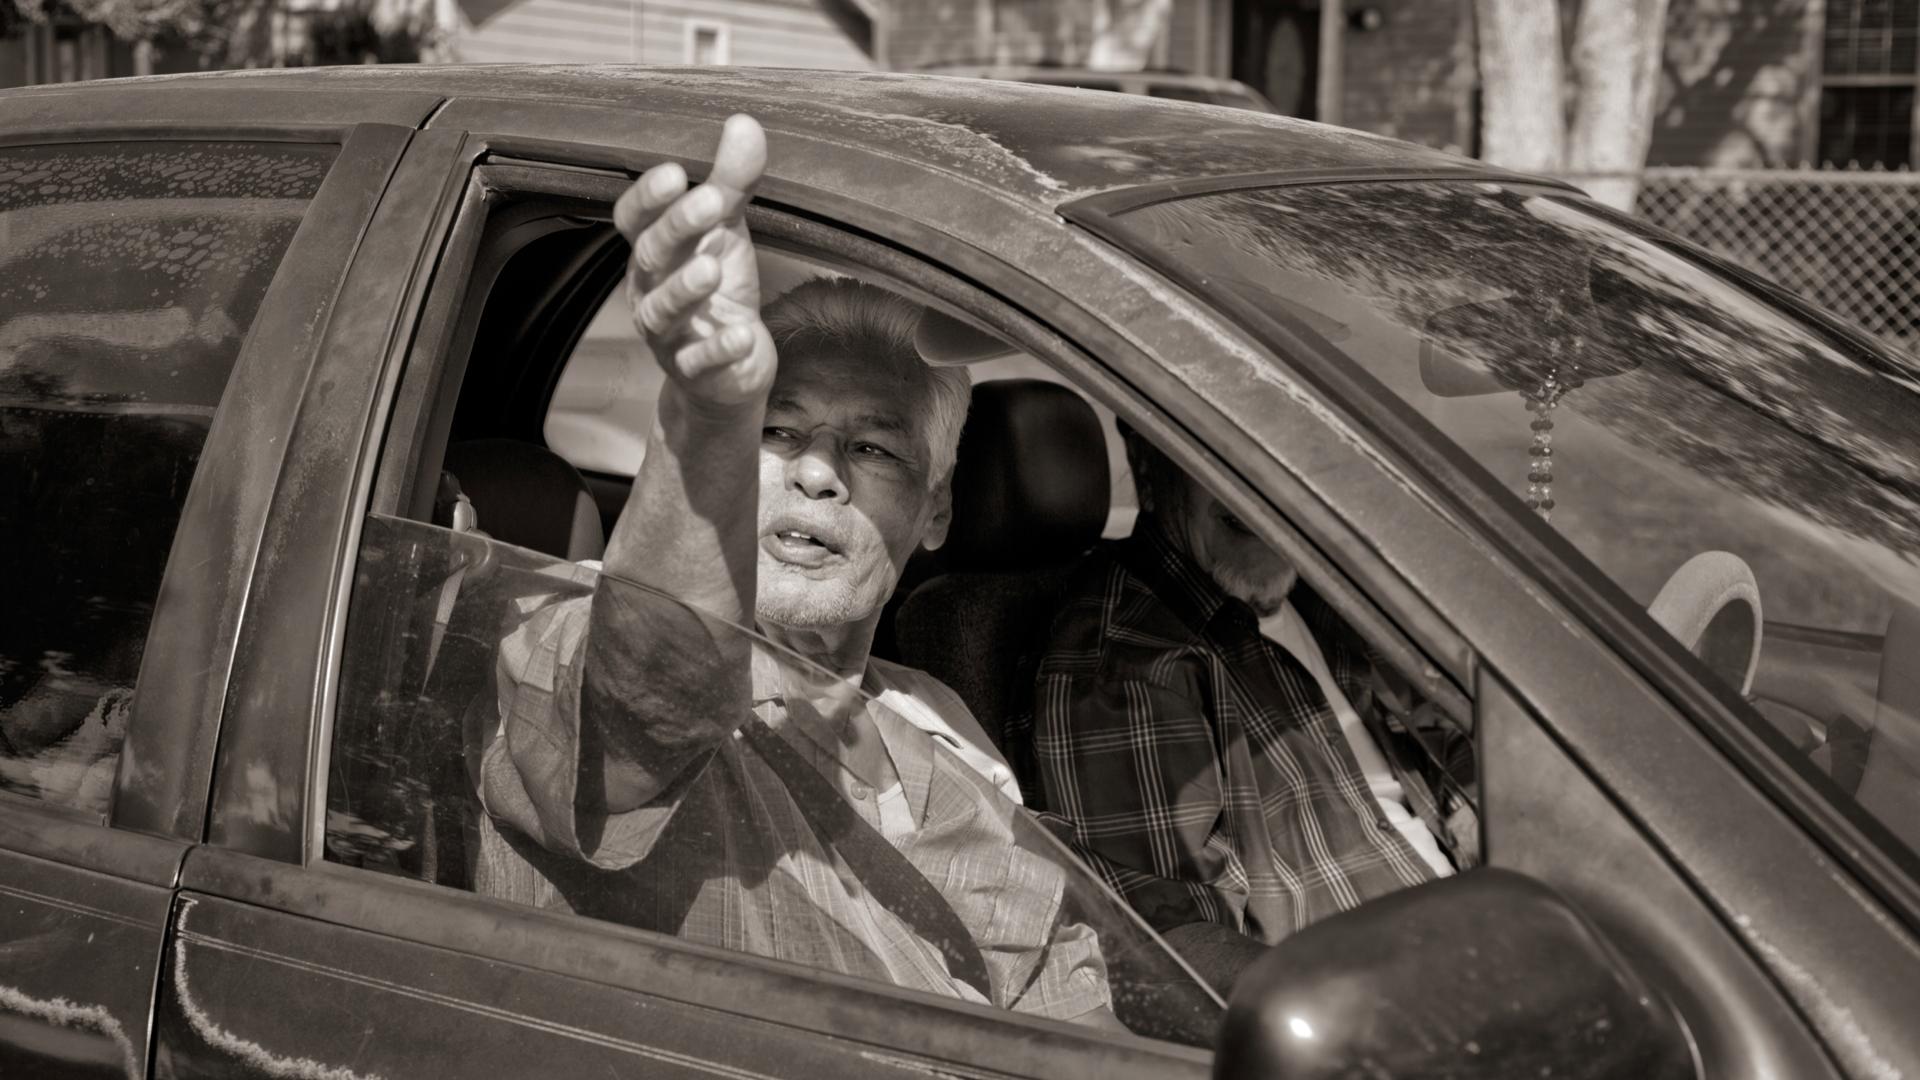 image5.handshake from car.jpeg